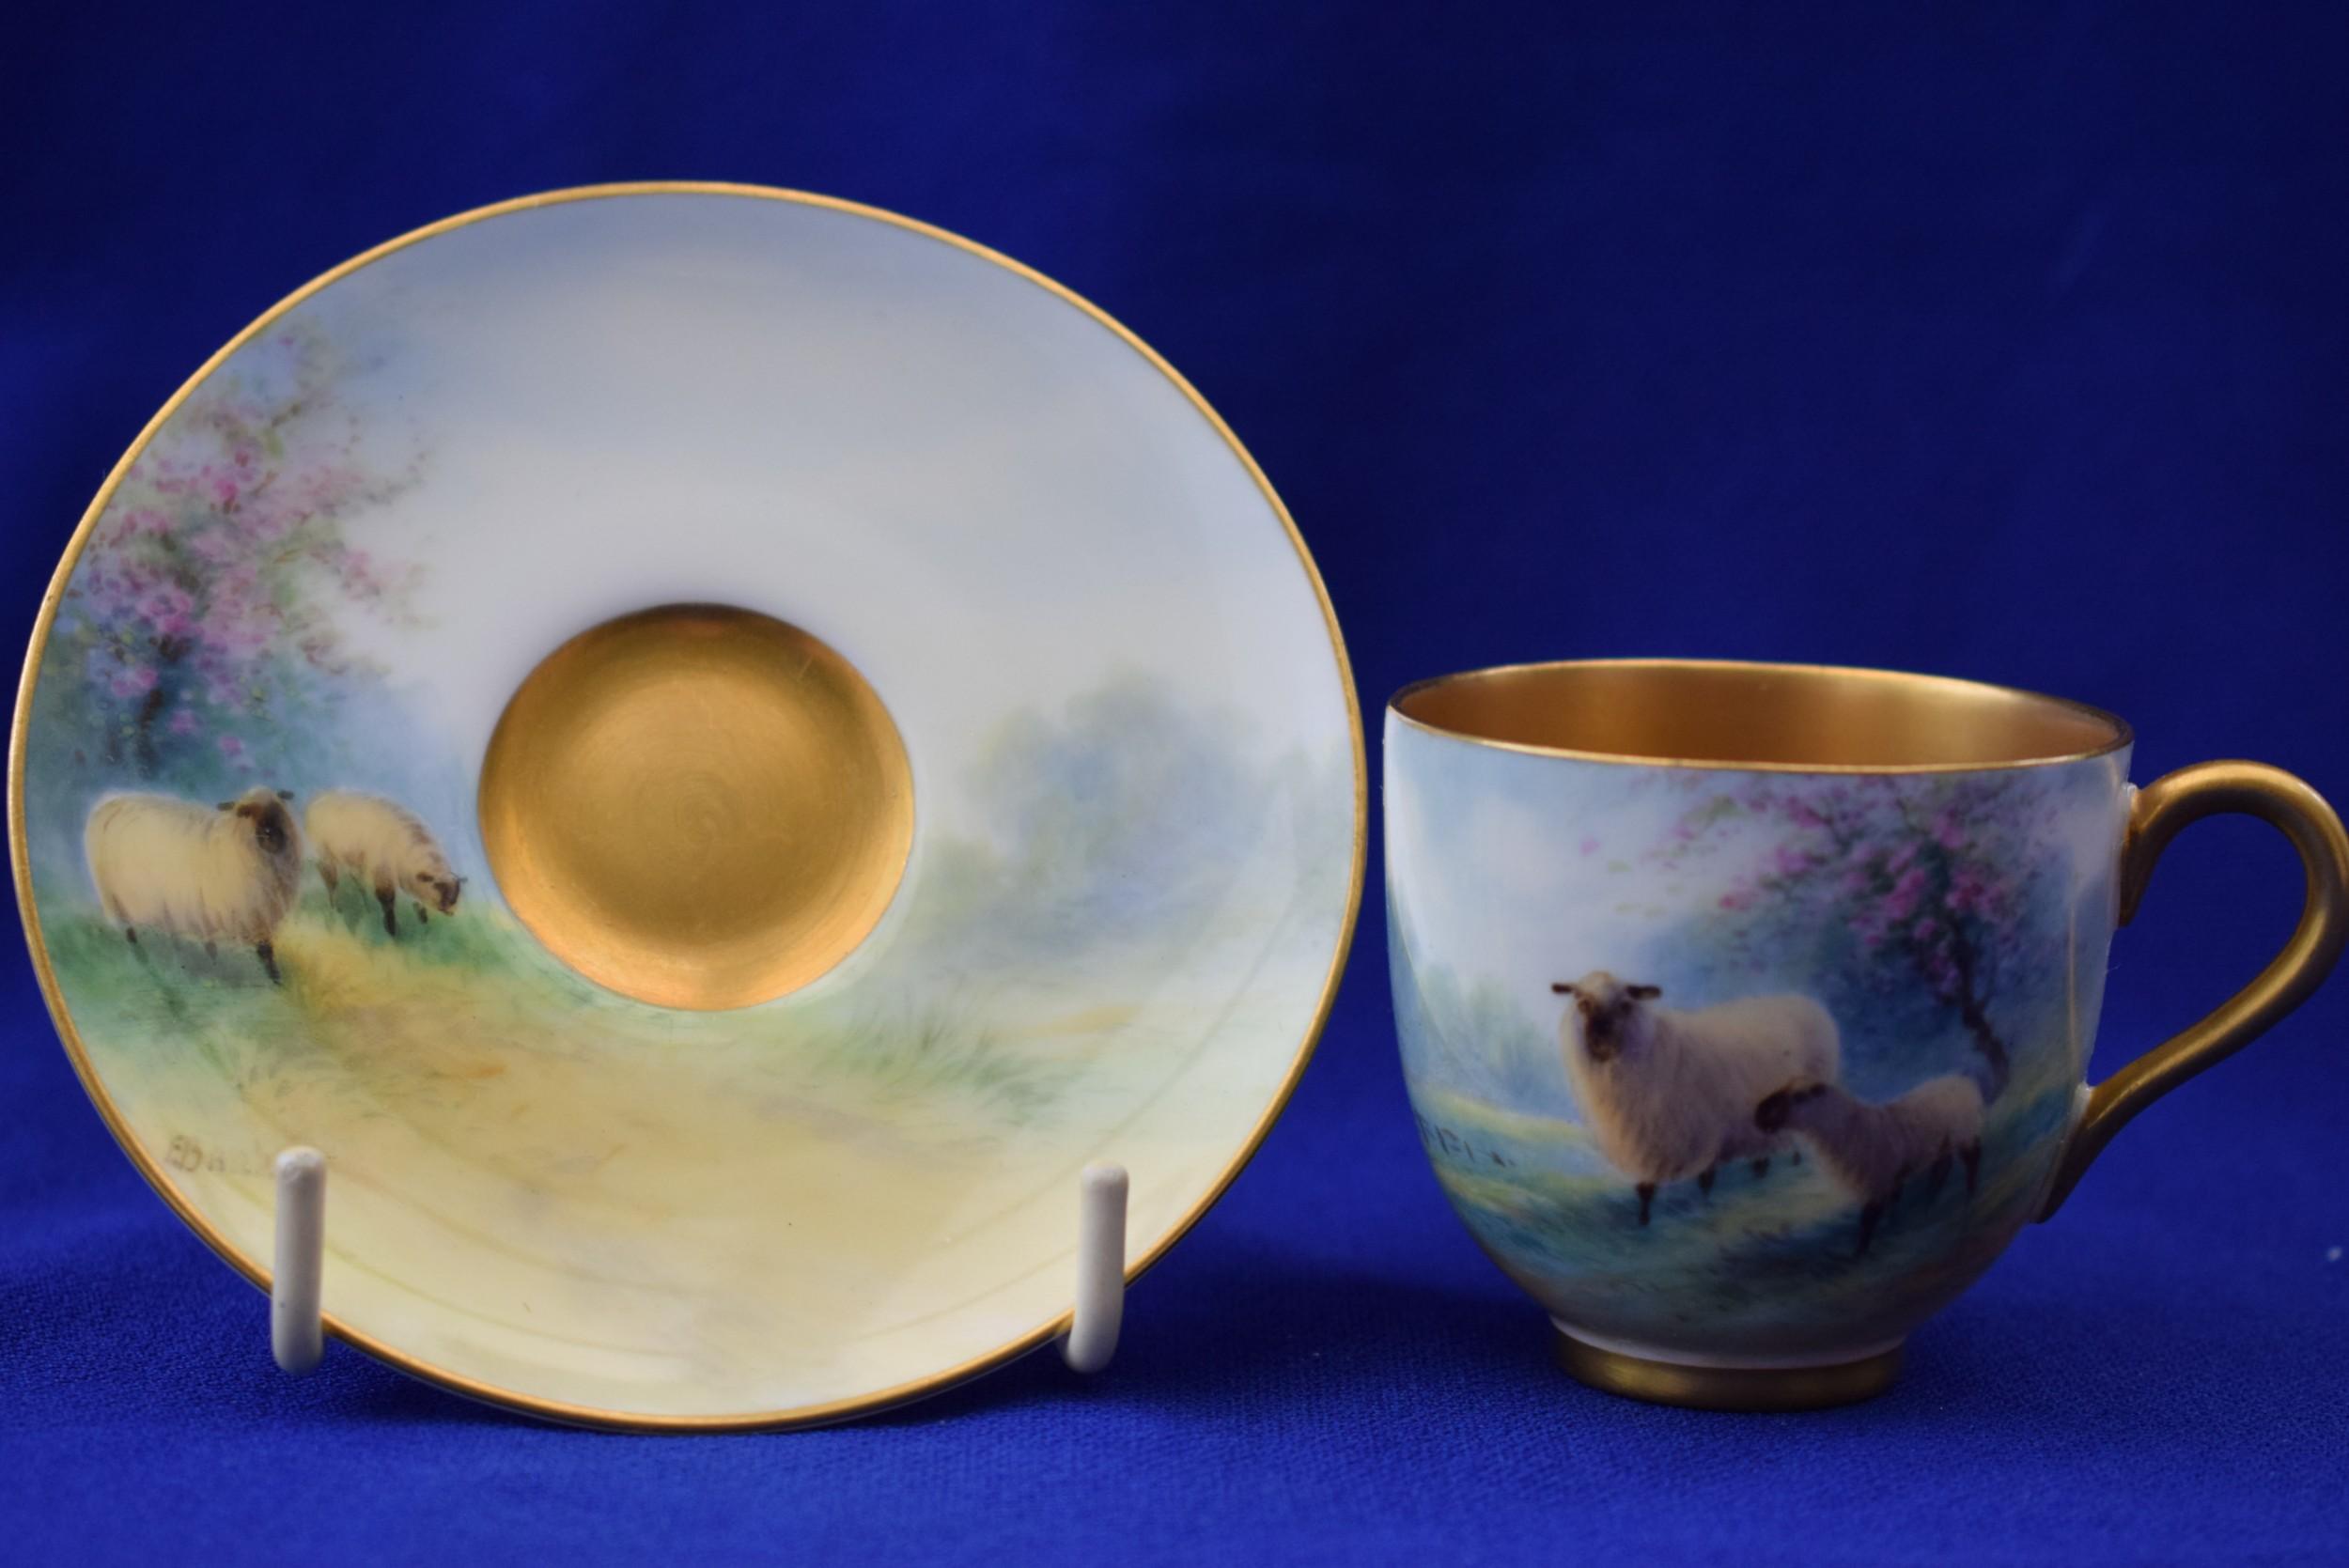 royal worcester demi tasse cup and saucer artist signed